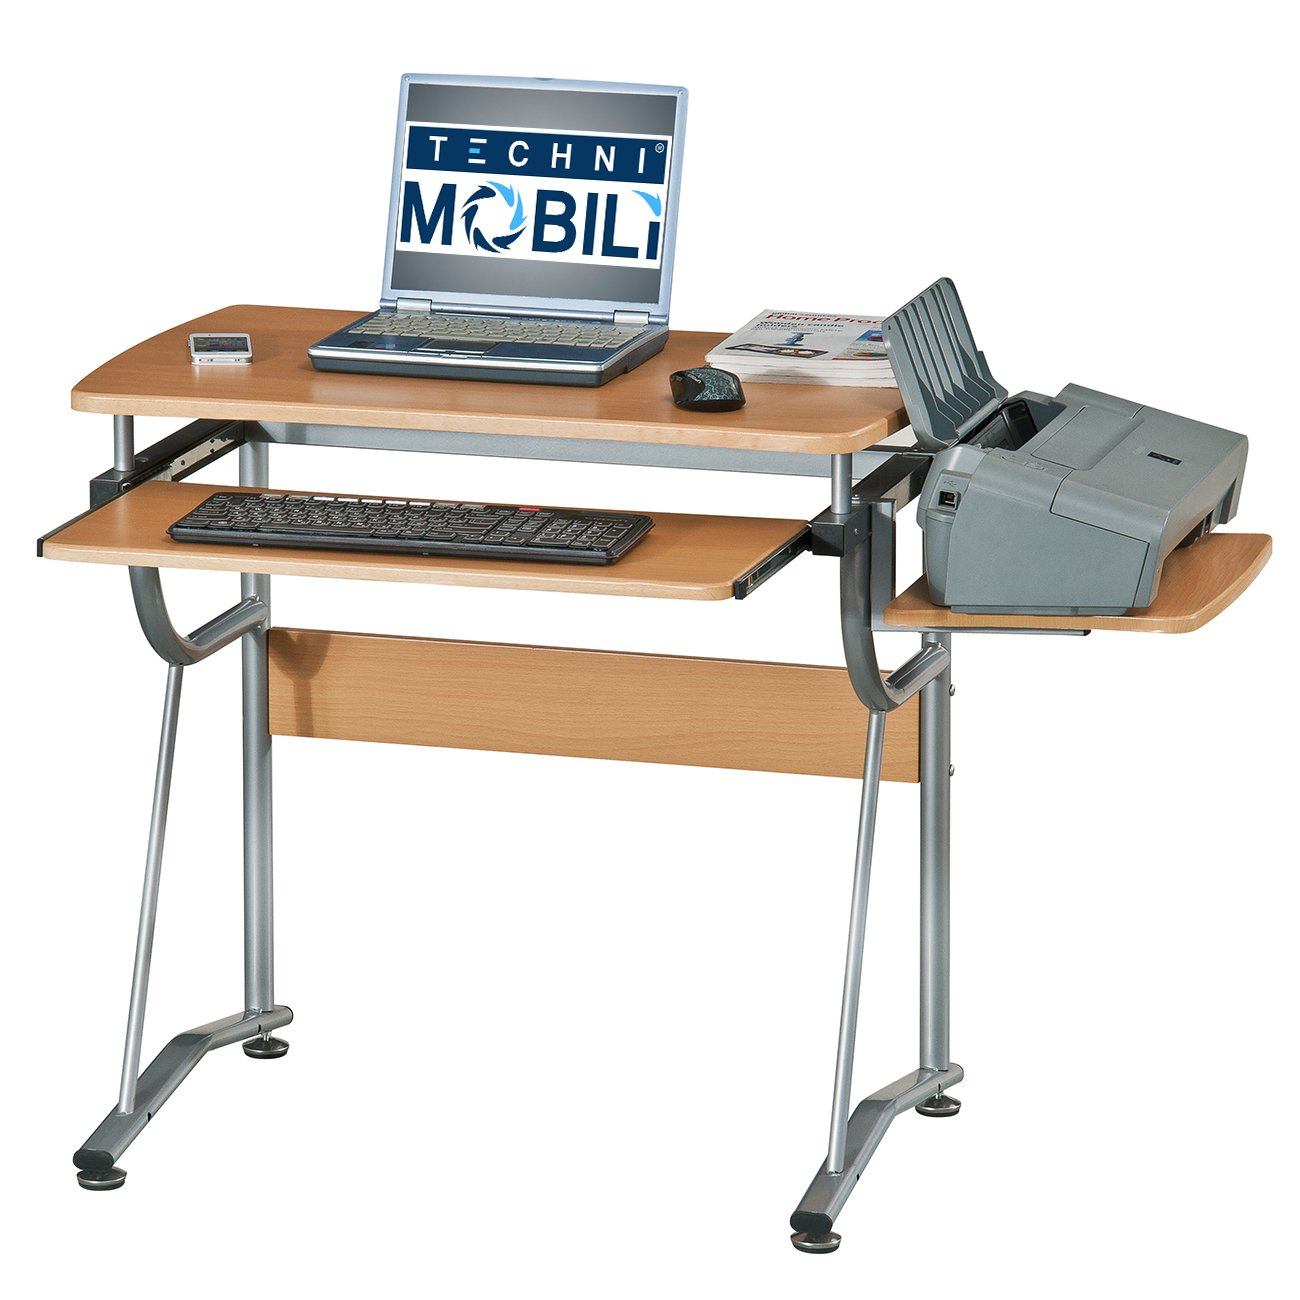 Amazon.com: Techni Mobili Compact Computer Desk With Side Shelf And ...